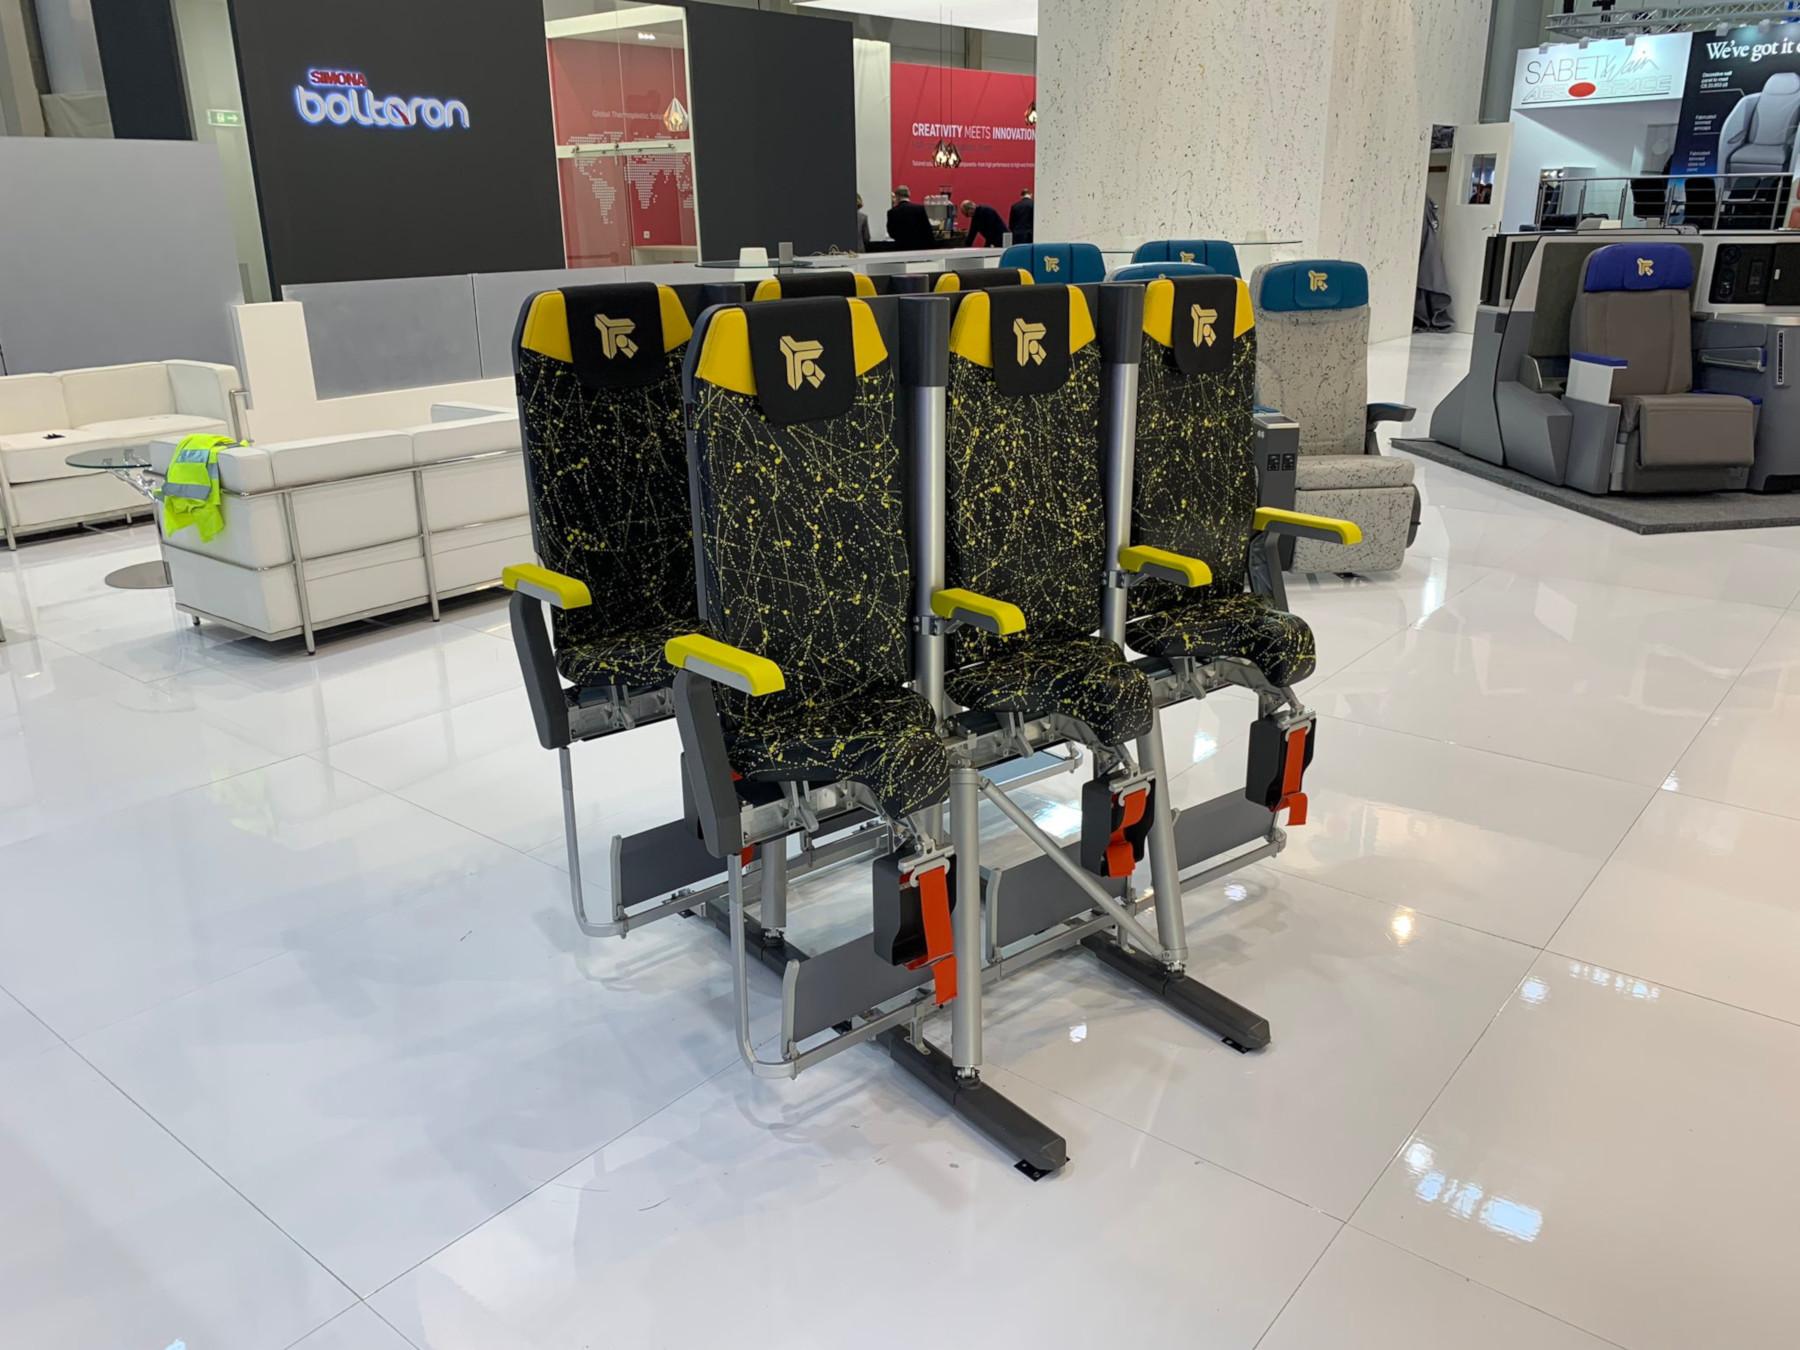 SkyRider 3.0 на выставке Expo 2019